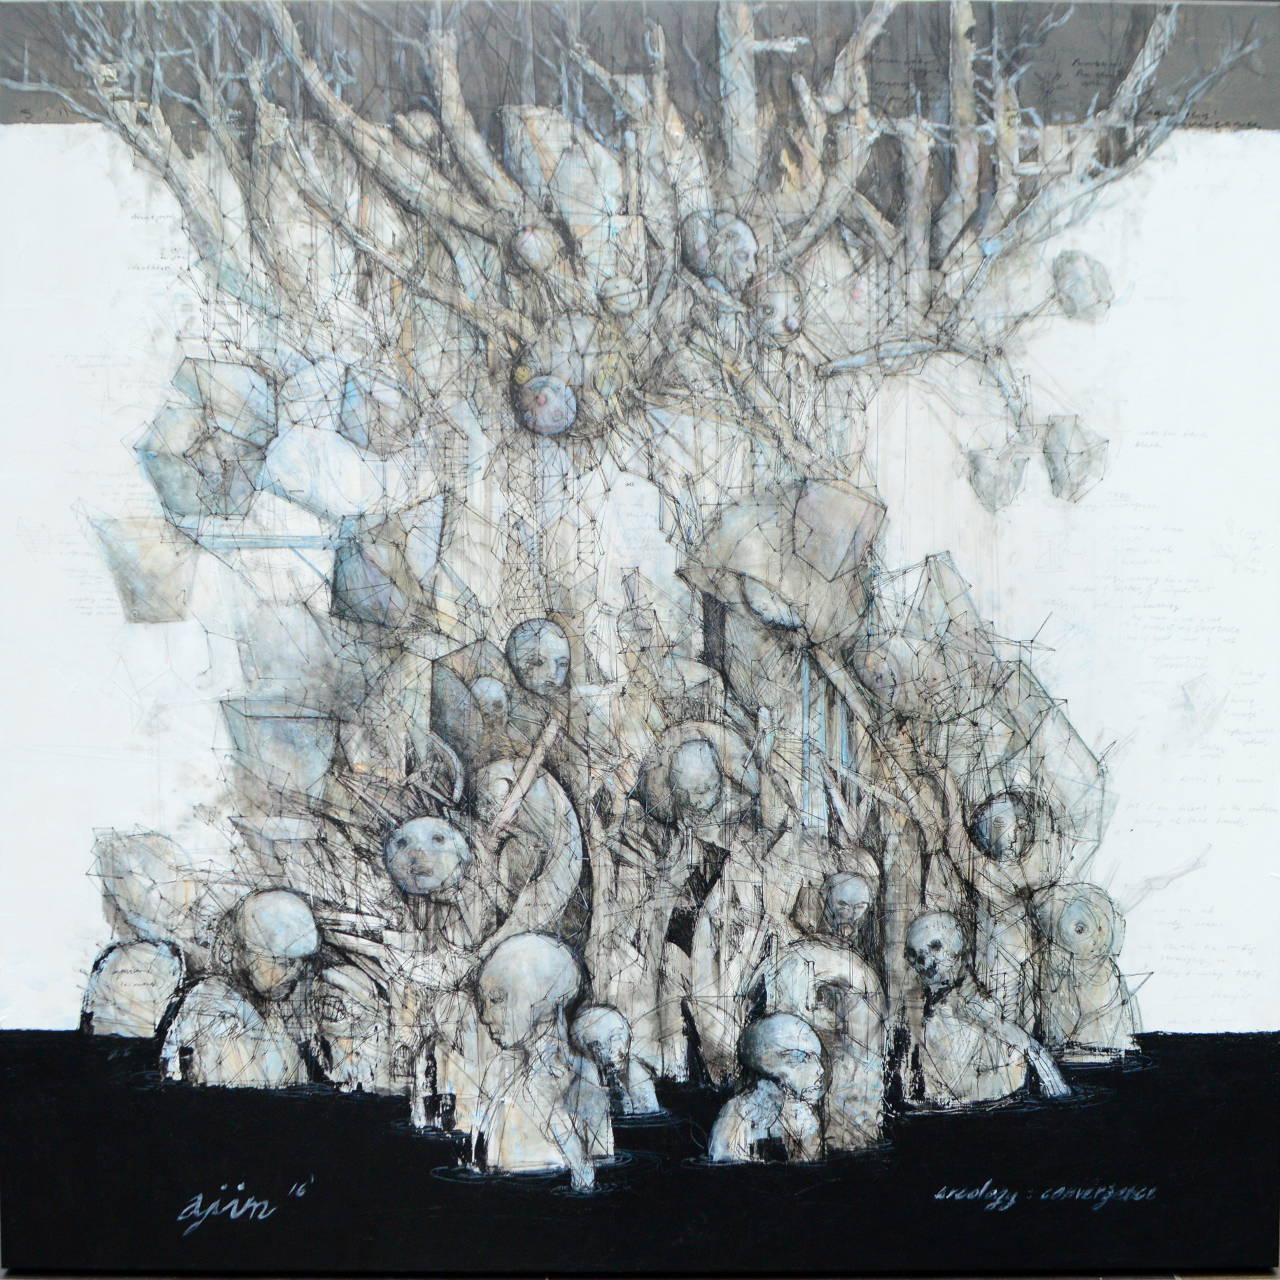 Ajim Juxta - Arcology: Convergence (2016) - Acrylic, Indian Ink & Pen on Canvas - 122 x 122 cm